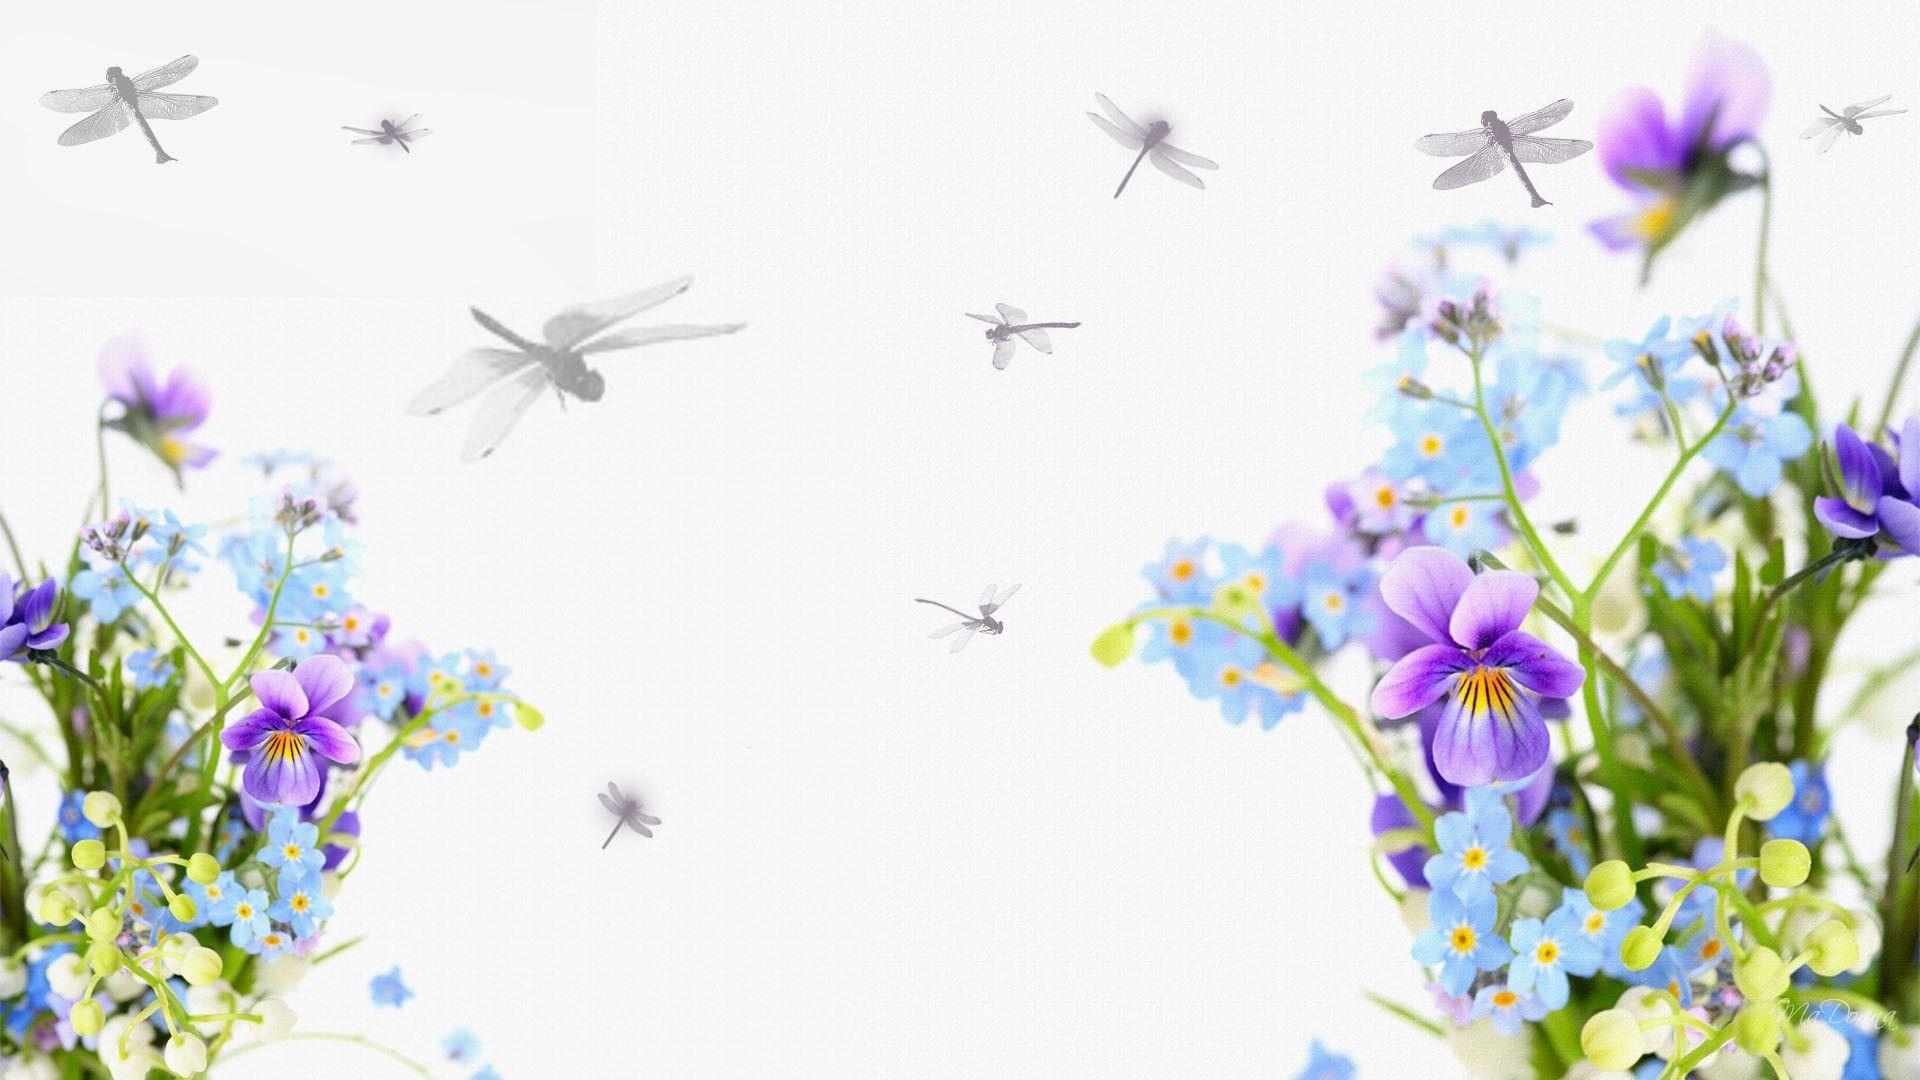 Gaines-Longman-dragonflies-pictures-desktop-1920-x-1080-px-wallpaper-wp3805764